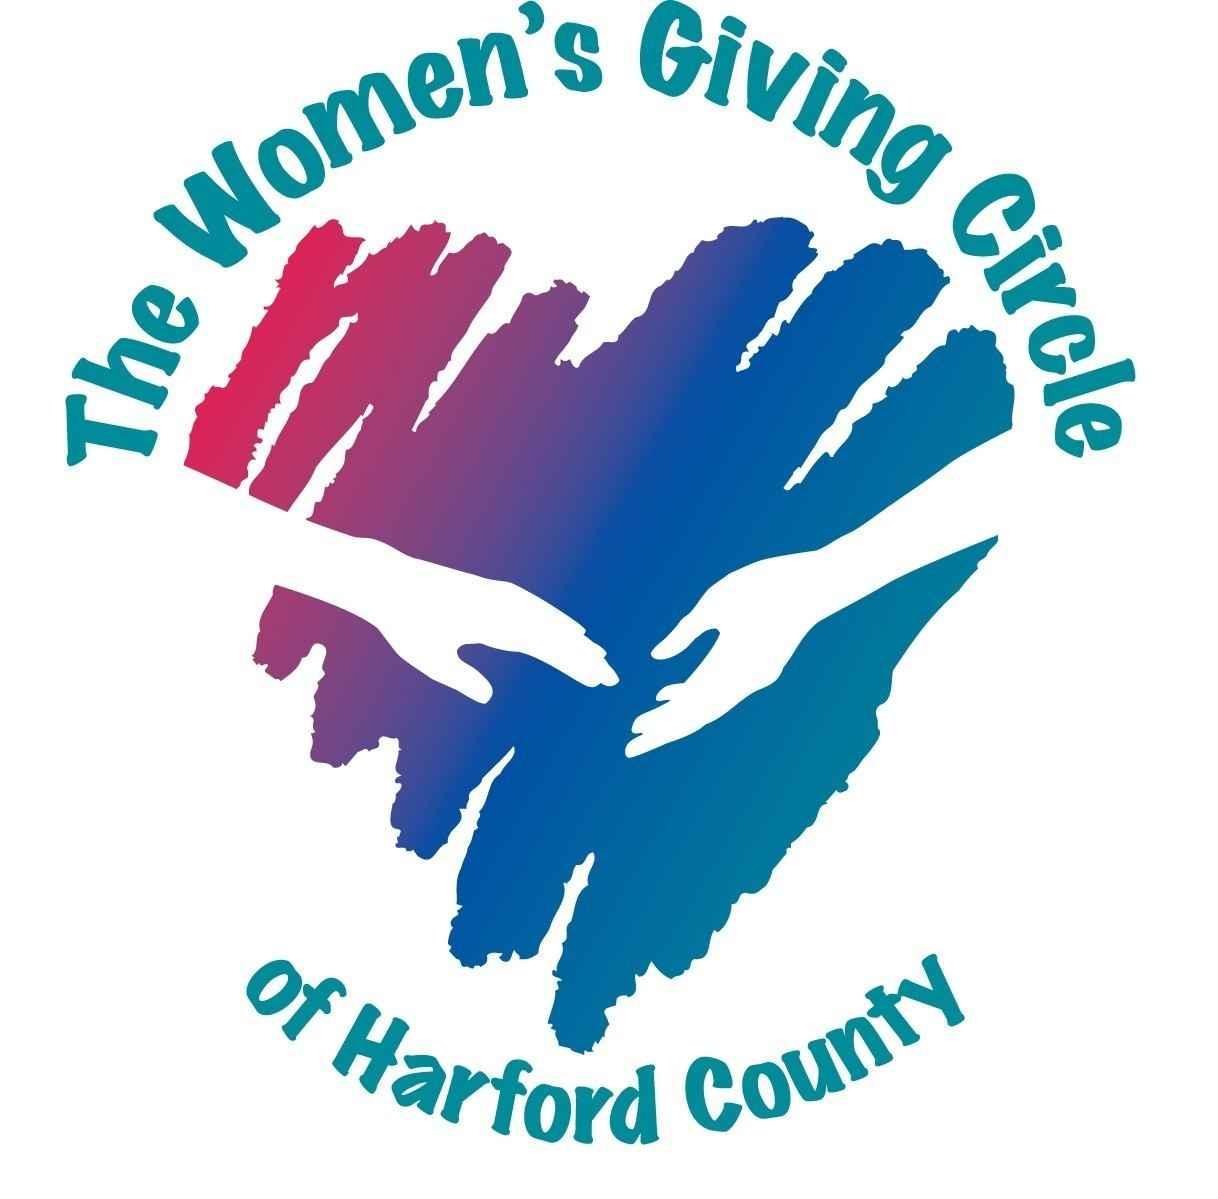 Community Foundation of Harford County image